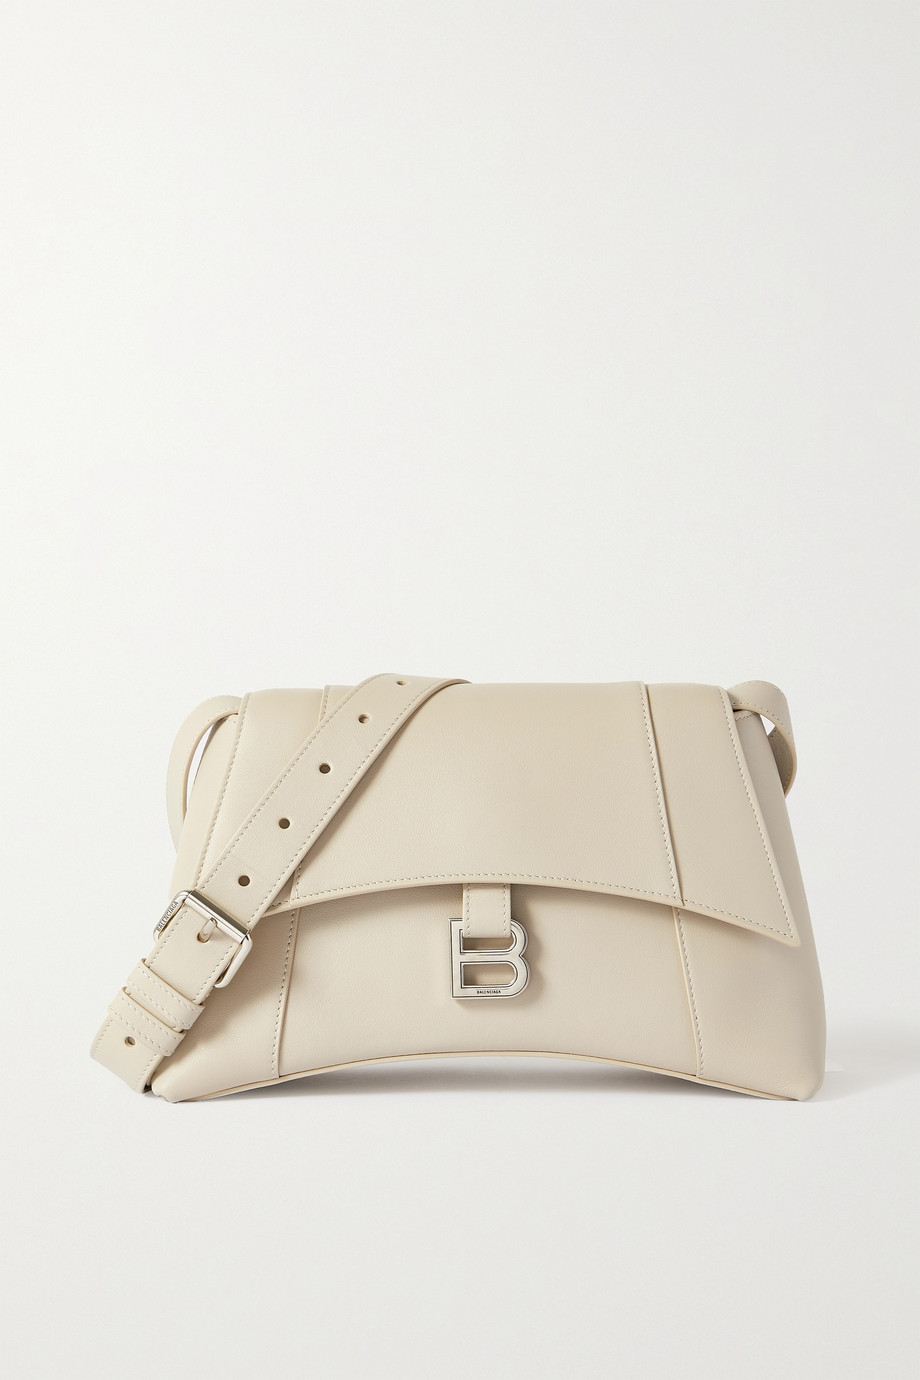 Balenciaga Hourglass small leather shoulder bag